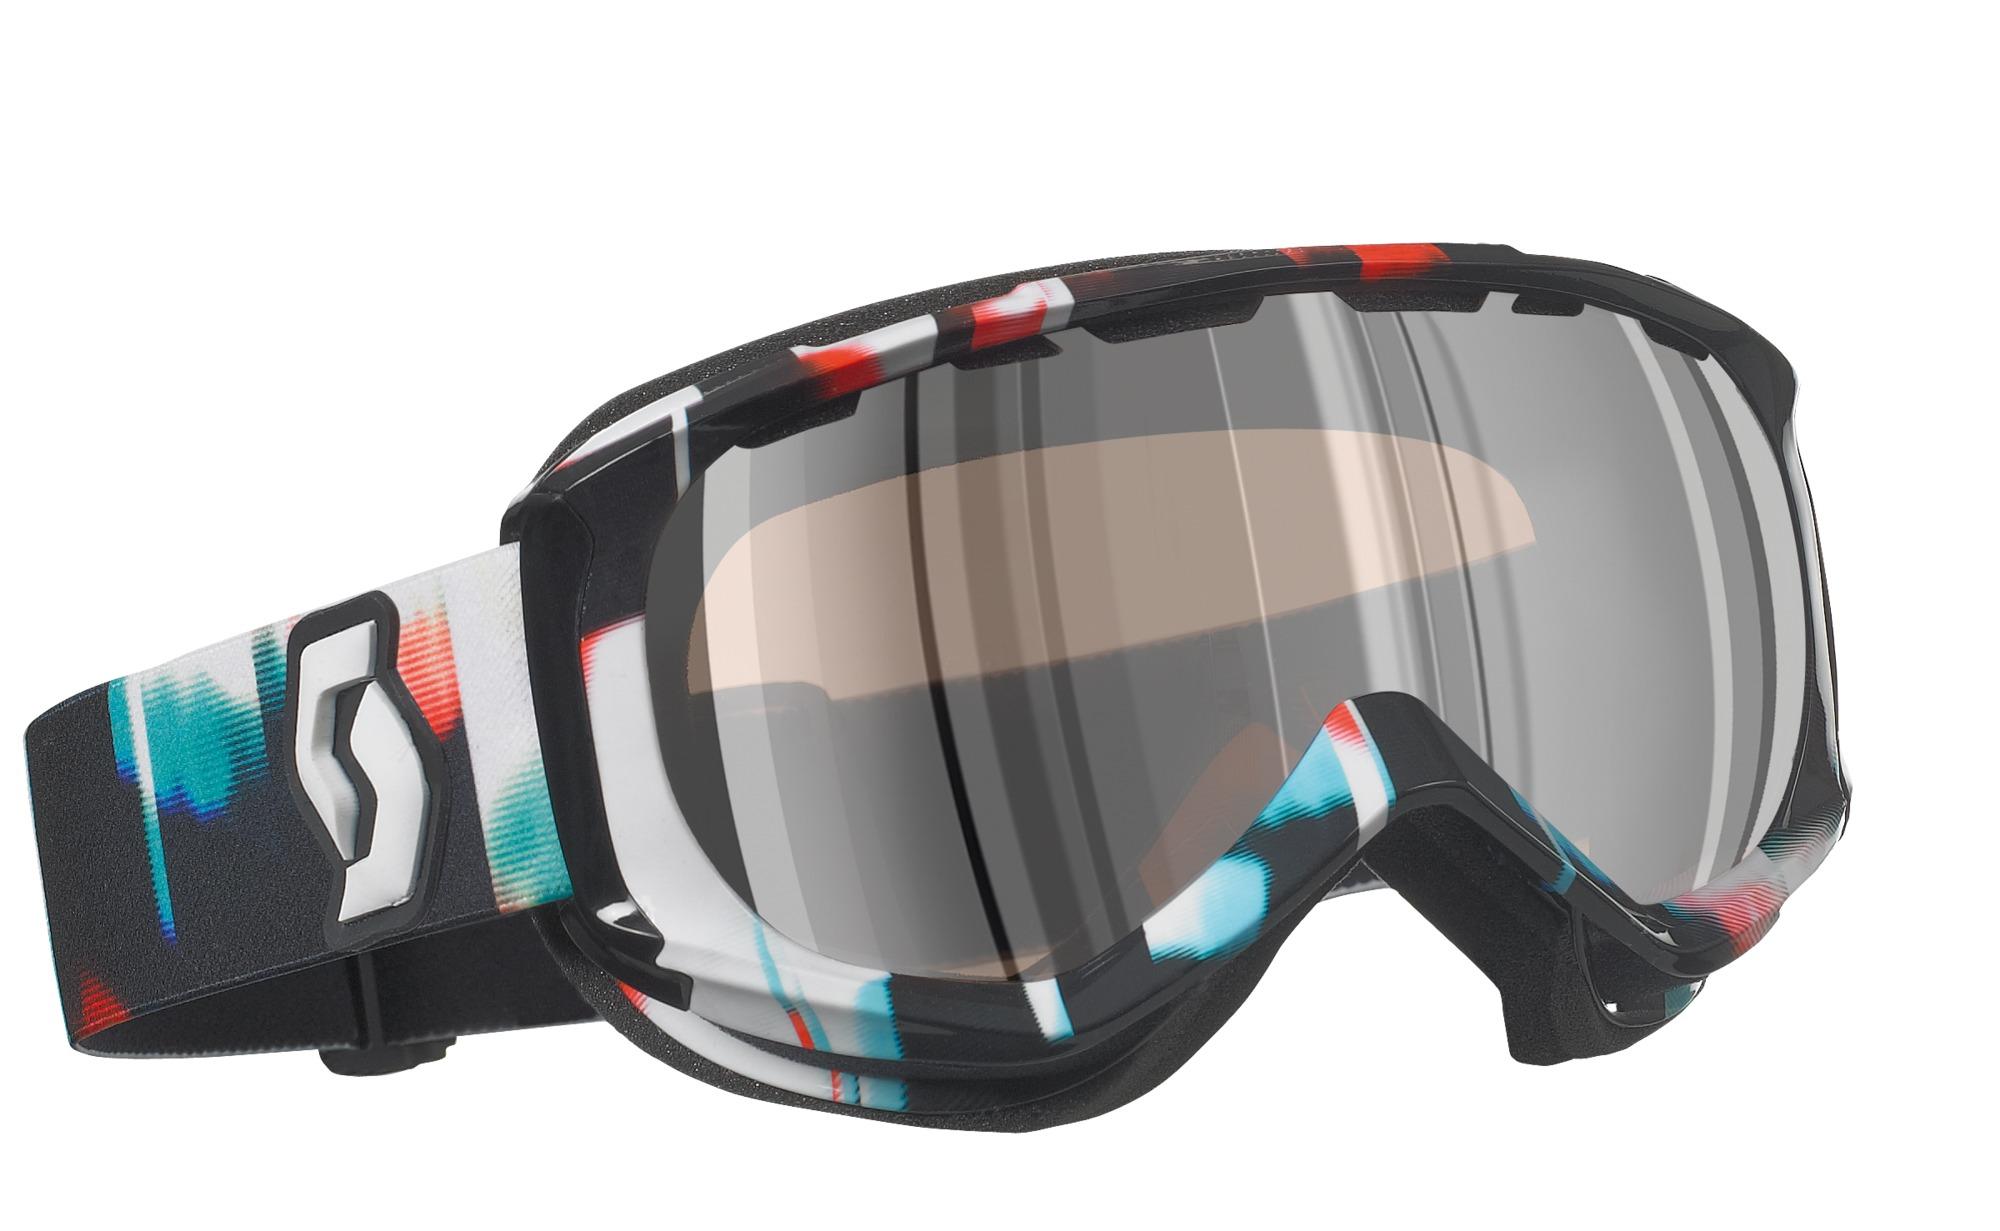 d38eaf5bf38 Ochelari Ski SCOTT REPLY SENSORY